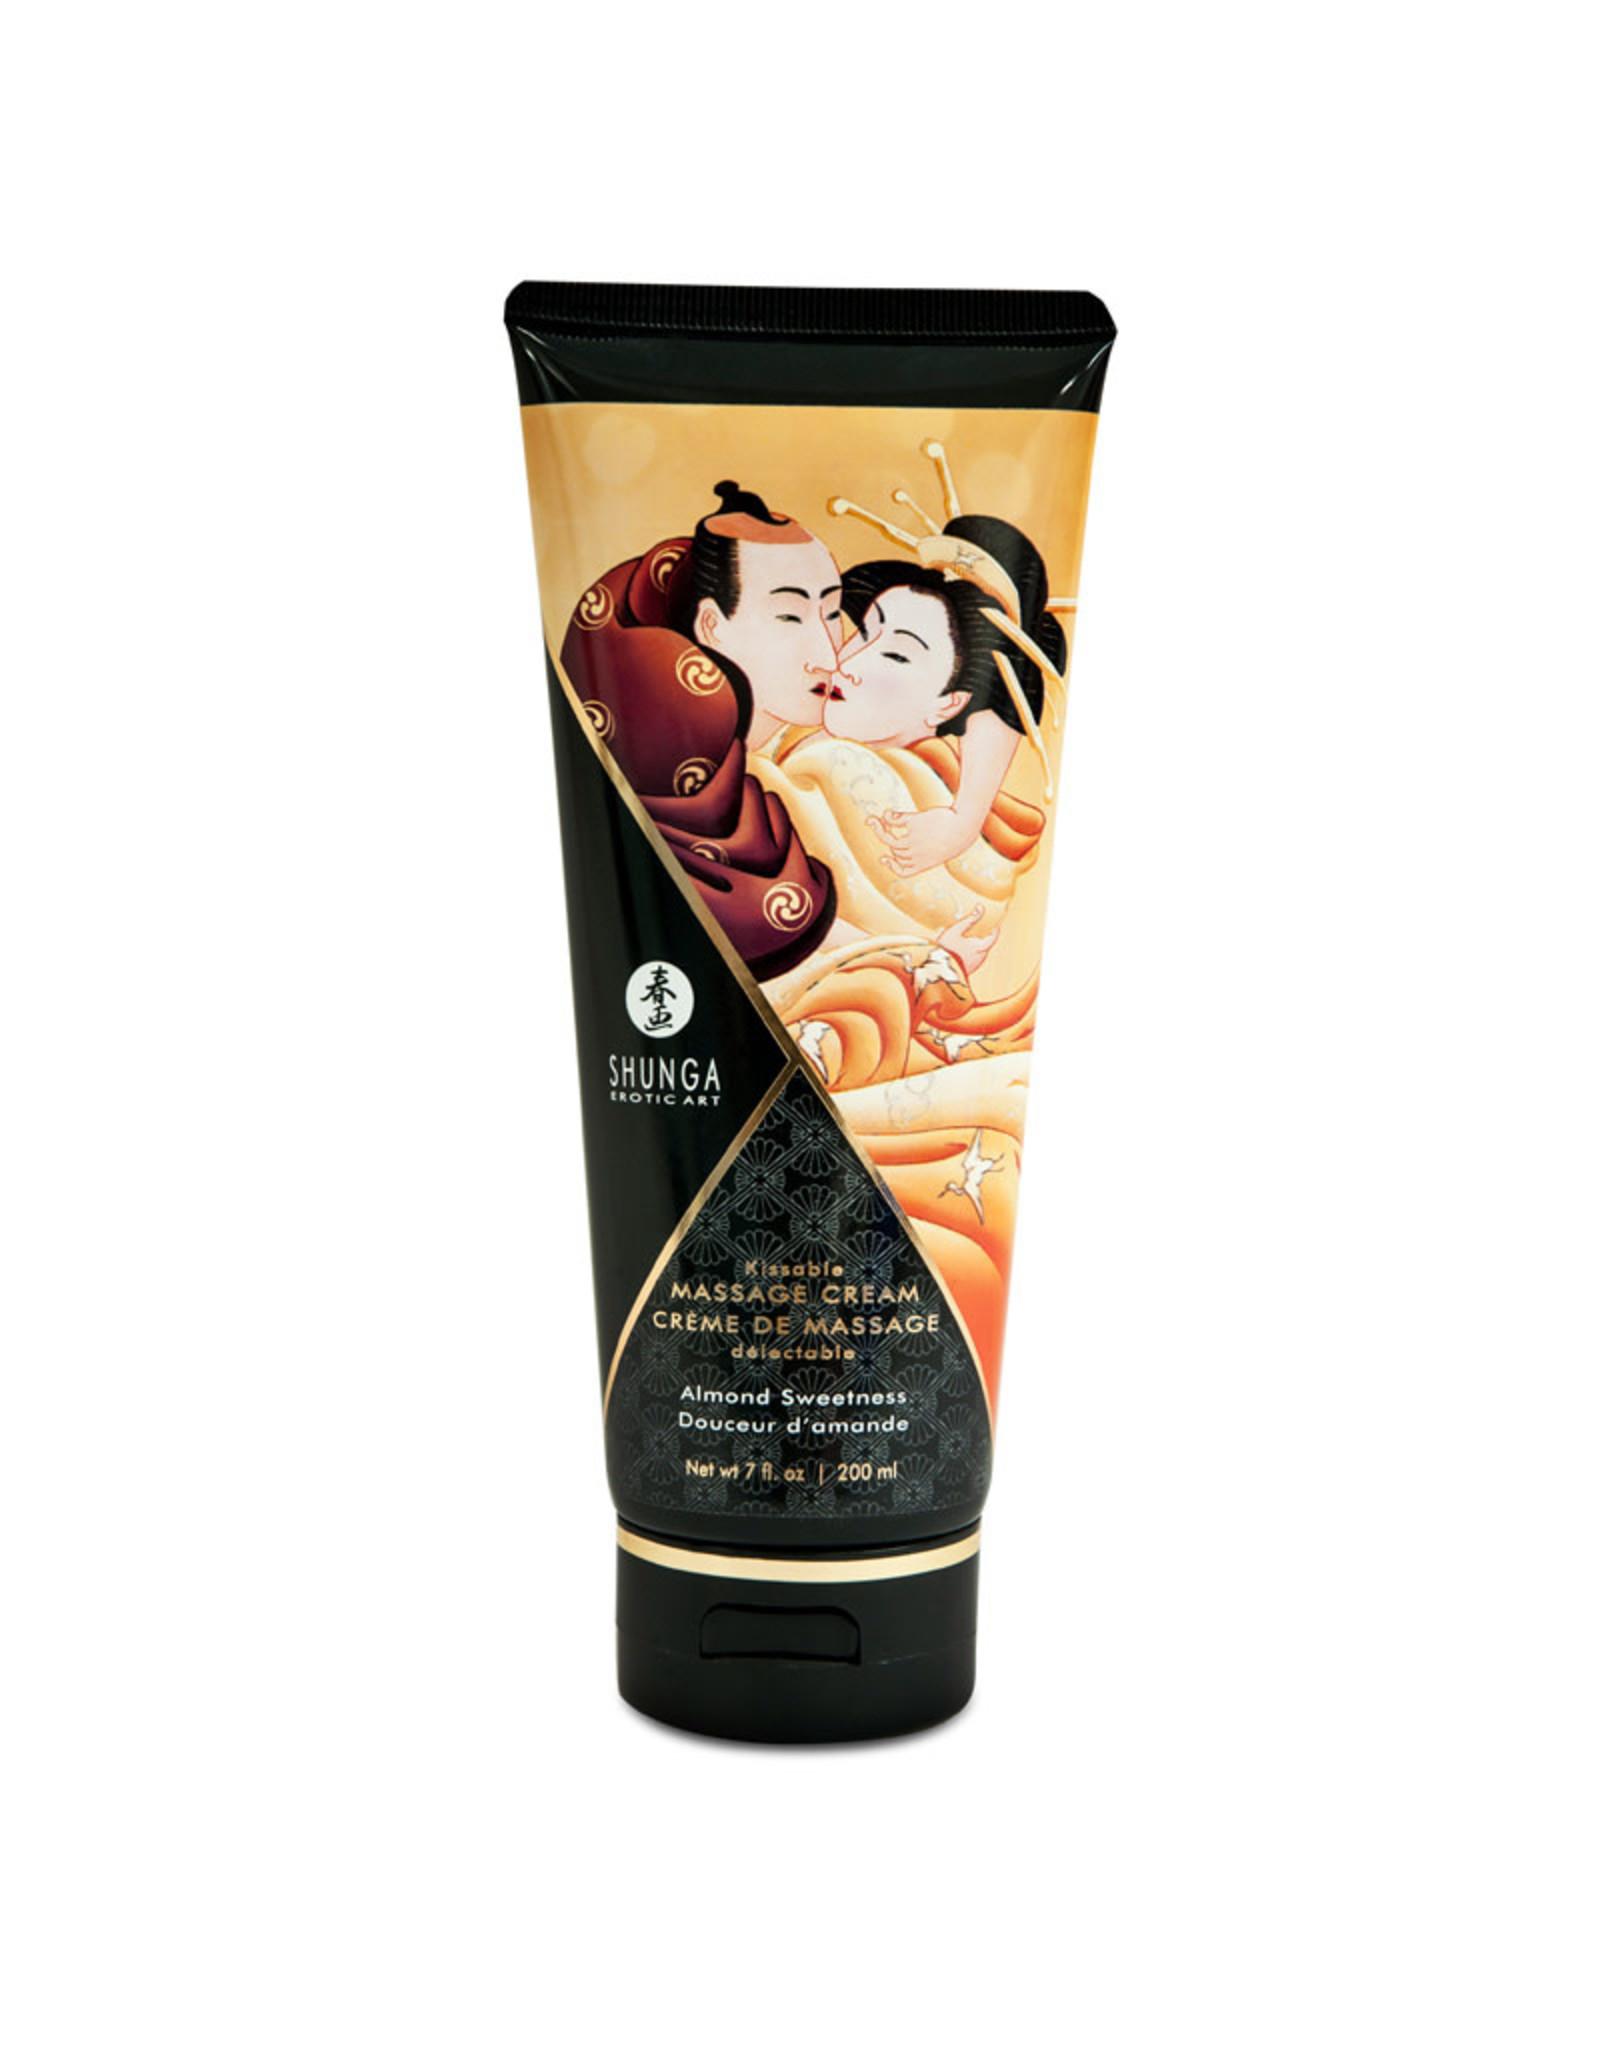 Shunga Shunga - Kissable Massage Cream - Almond Sweetness